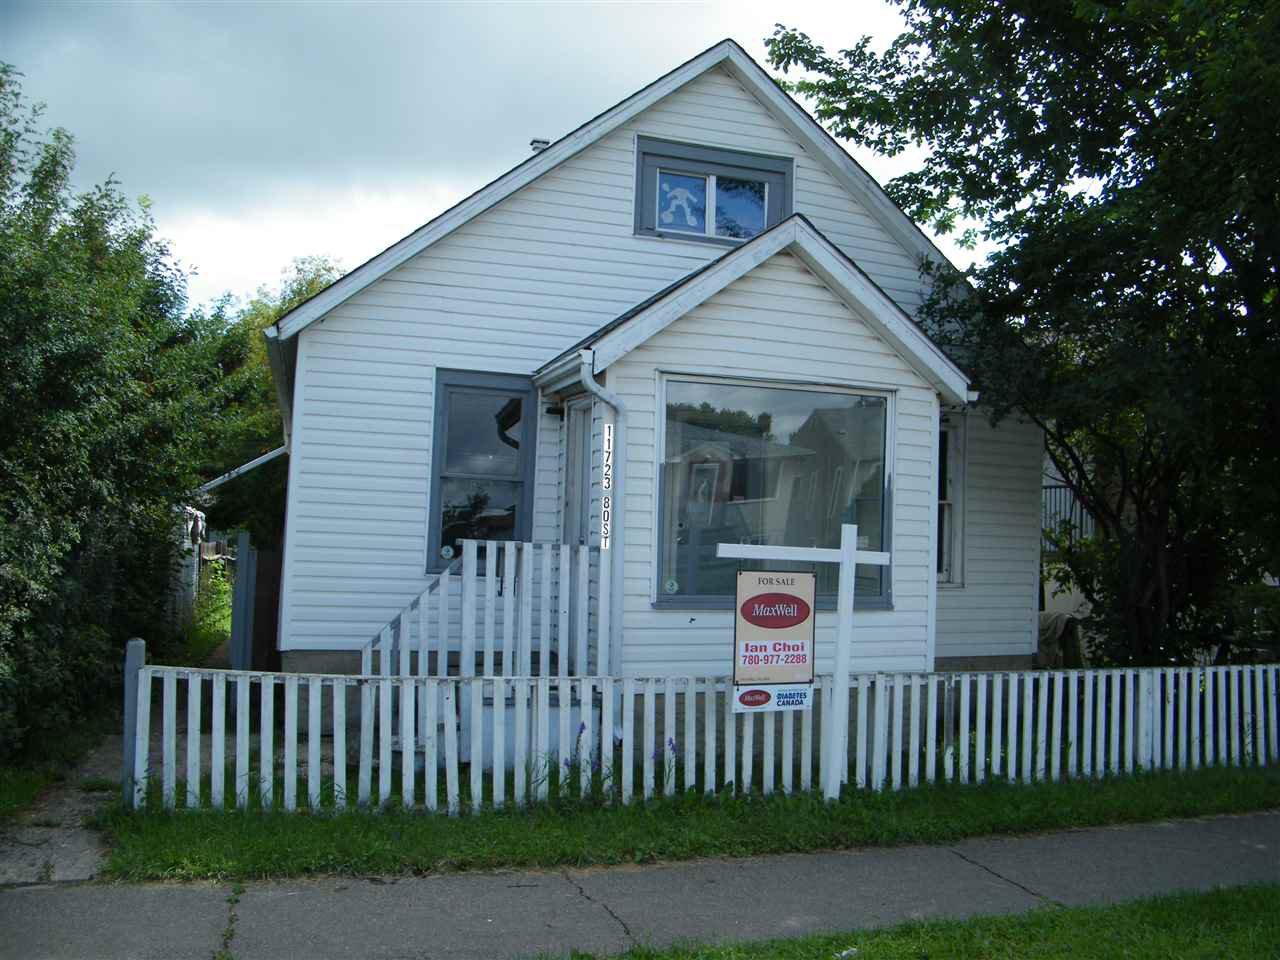 Main Photo: 11723 80 Street in Edmonton: Zone 05 House for sale : MLS®# E4168547